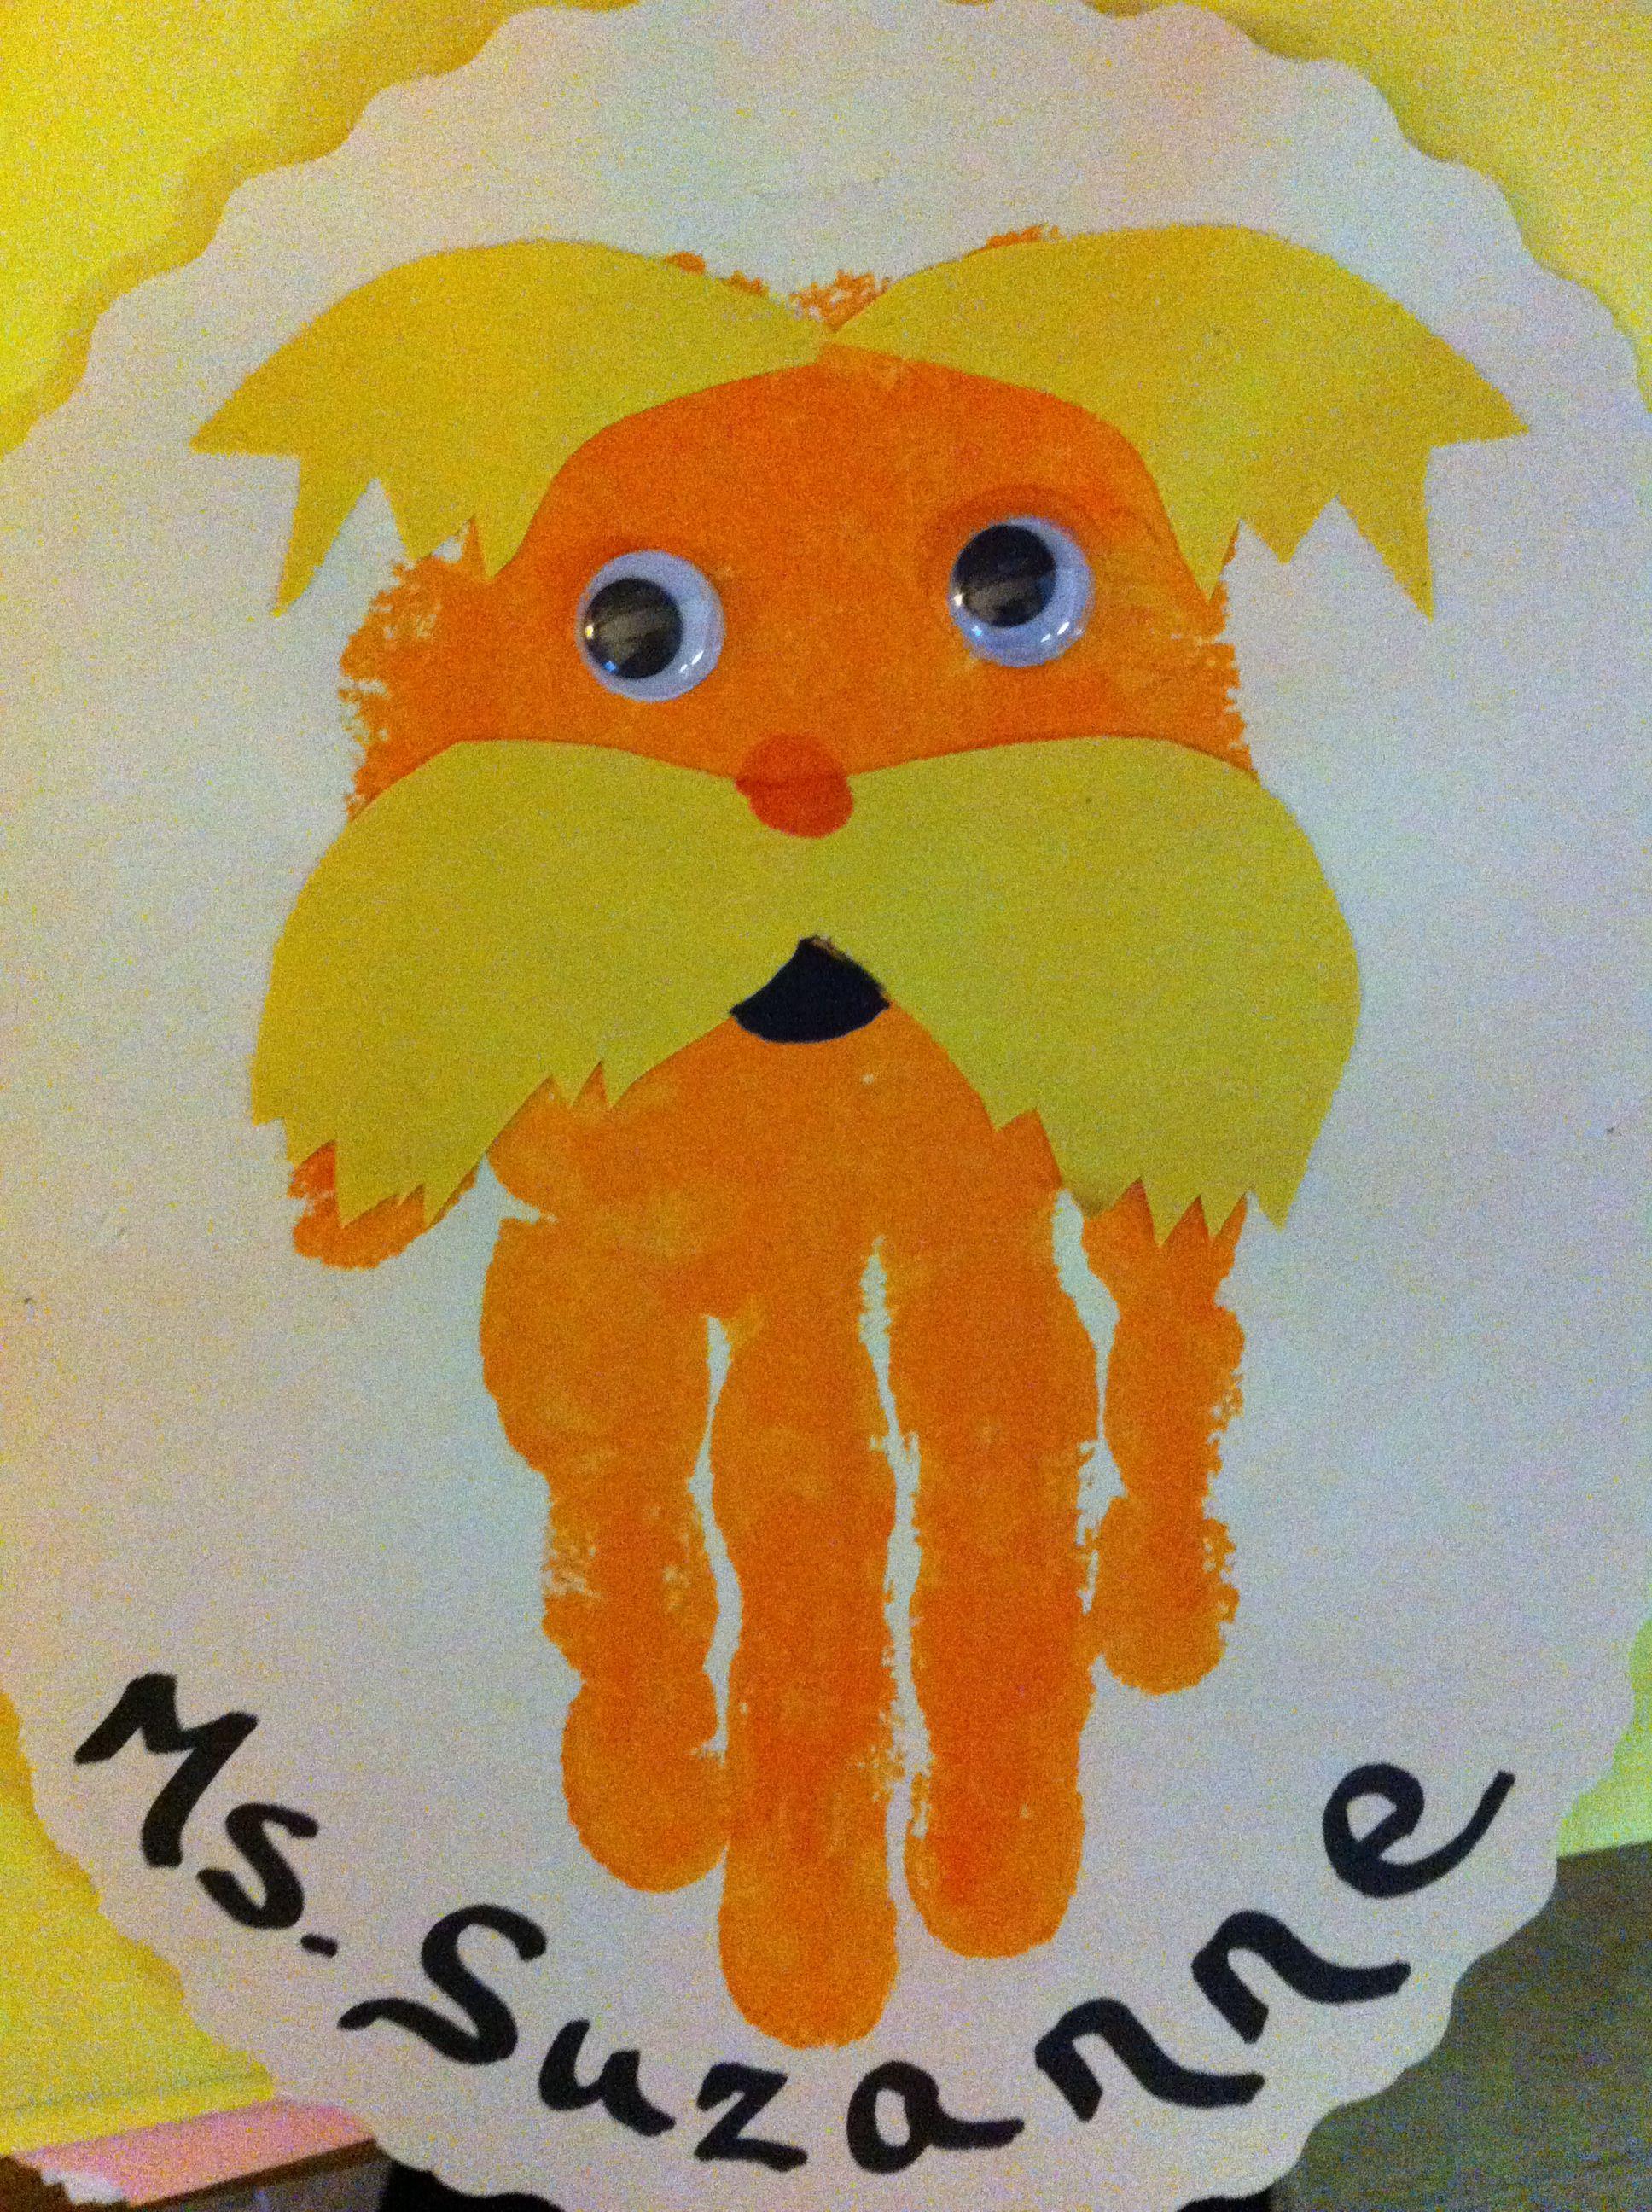 Lorax handprint craft for preschoolers | Kids books, stories, songs ...